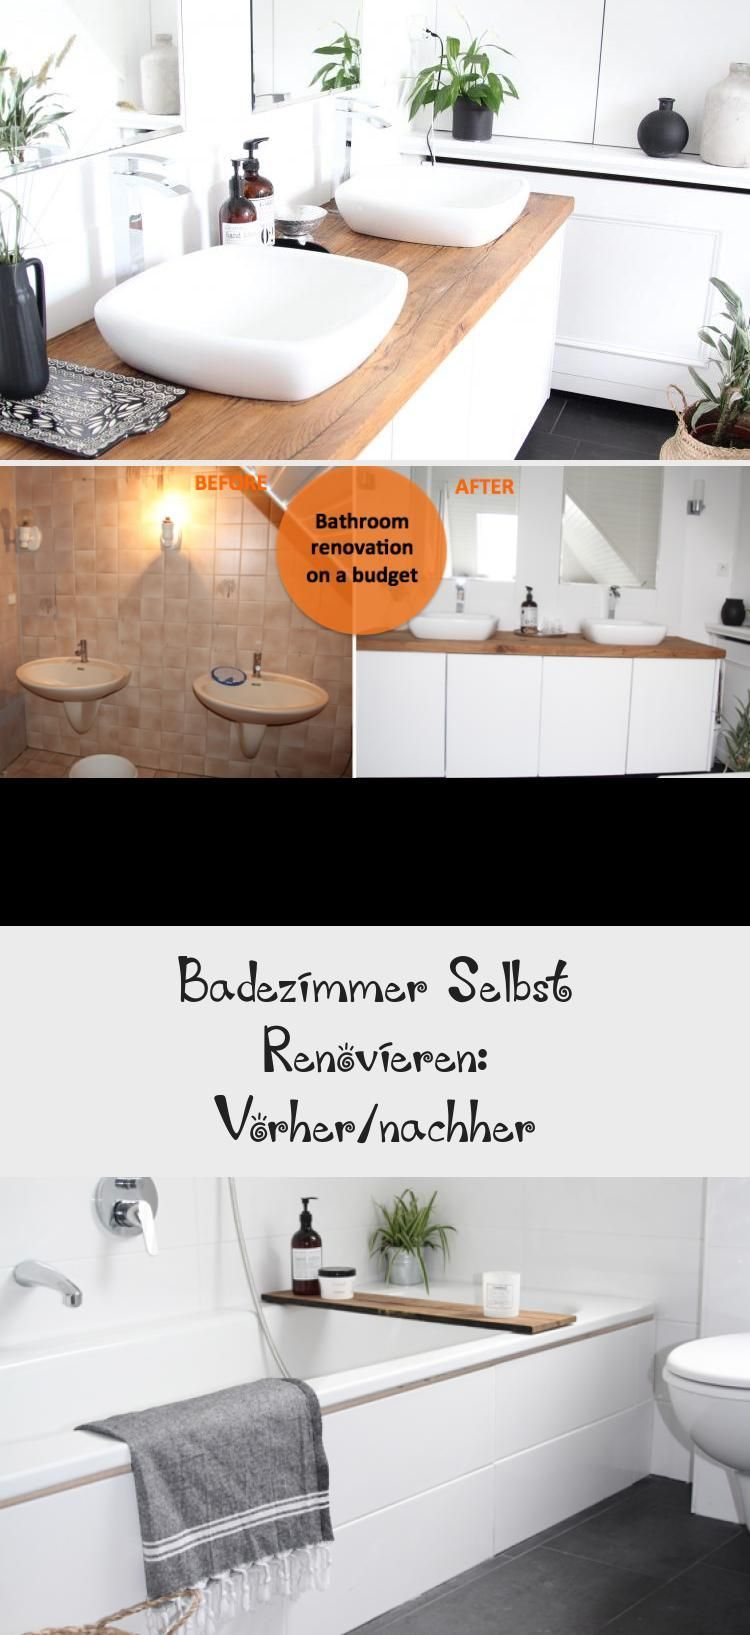 Badezimmer Wellnessoase Bad Deko Bad Deko Diy Ba In 2020 Bad Deko Badezimmer Bad Renovieren